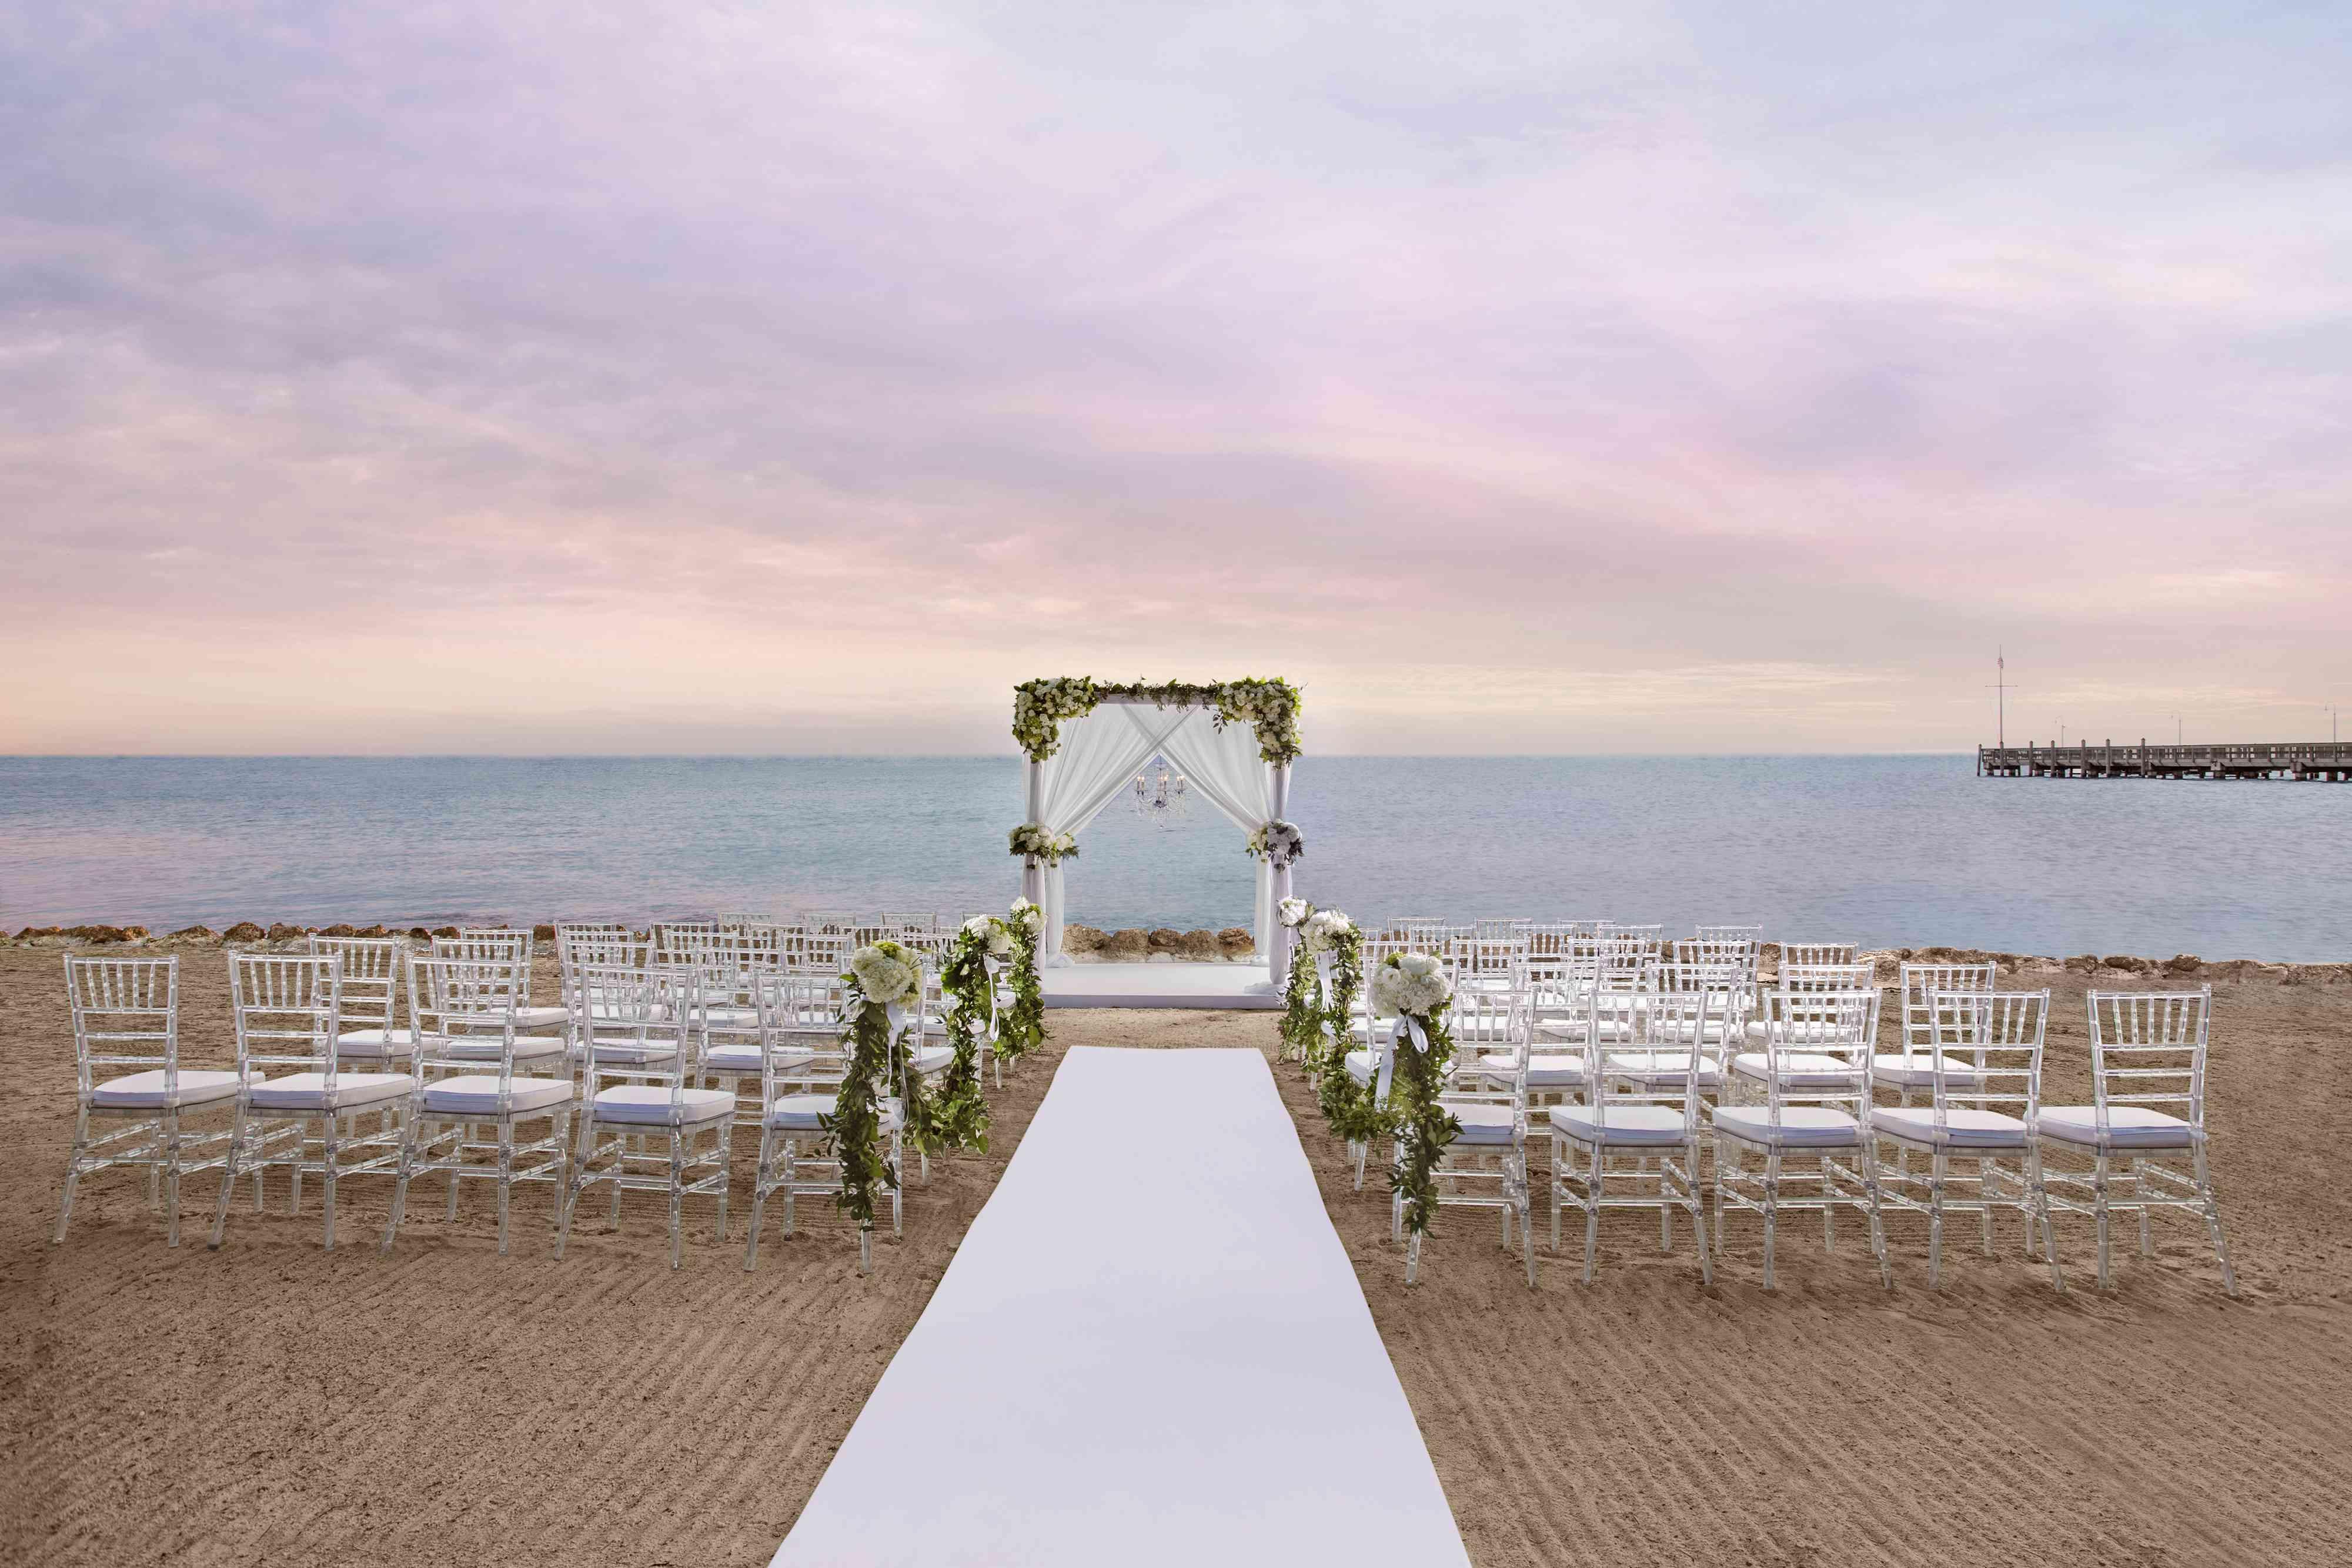 Intimate wedding on the beach at sunset at Casa Marina Key West